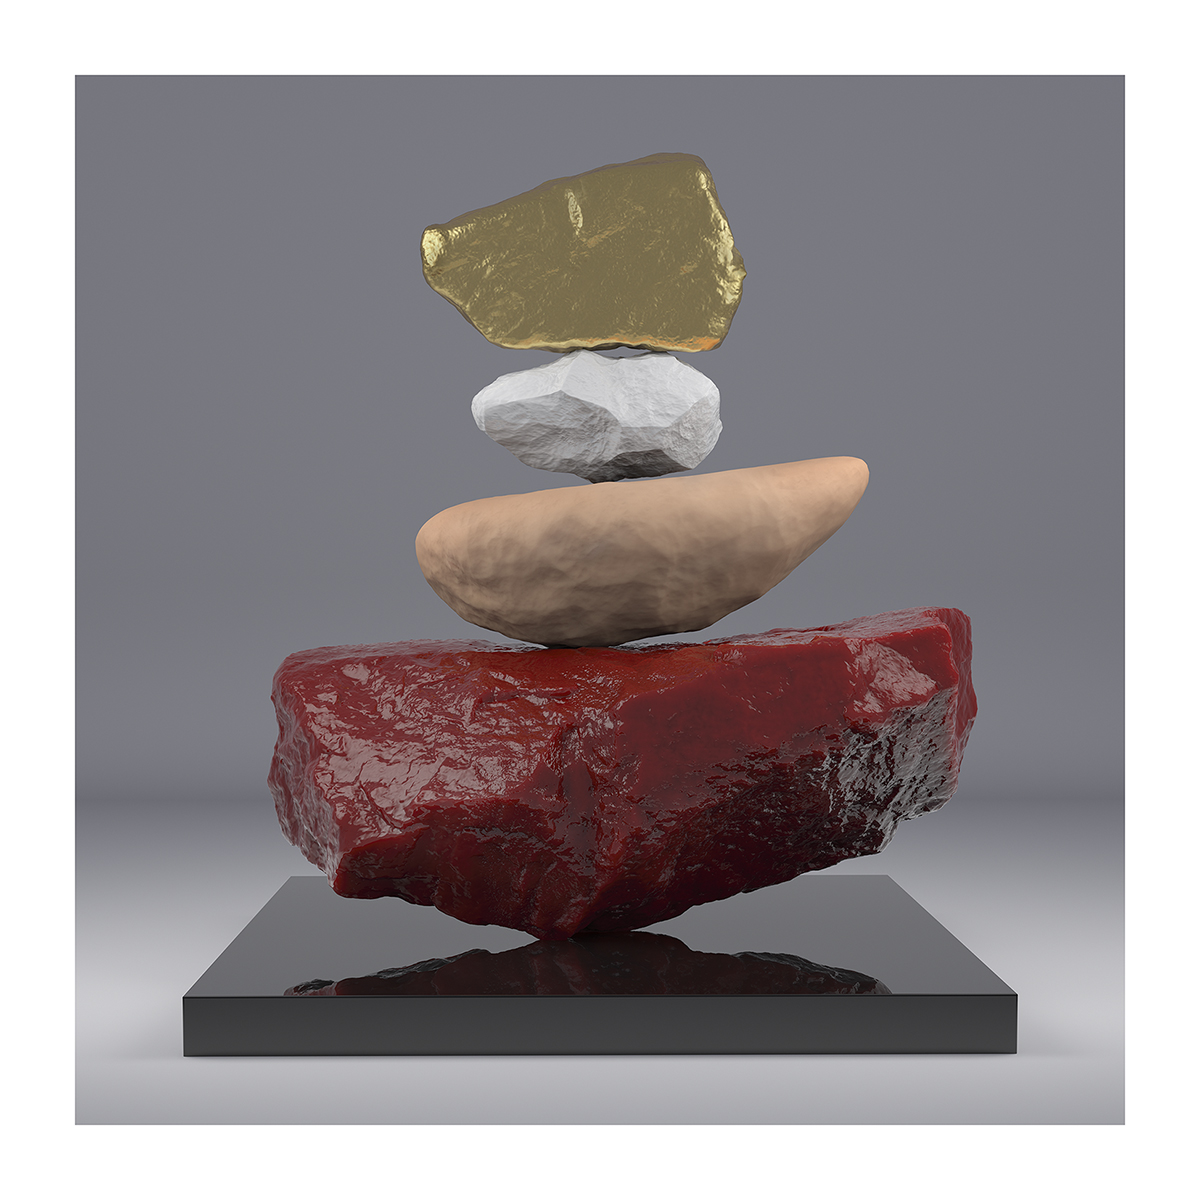 I will not Make any more Boring Art VII 001 1 - 2020 - I will not Make any more Boring Art. VII. (Rock Balancing)